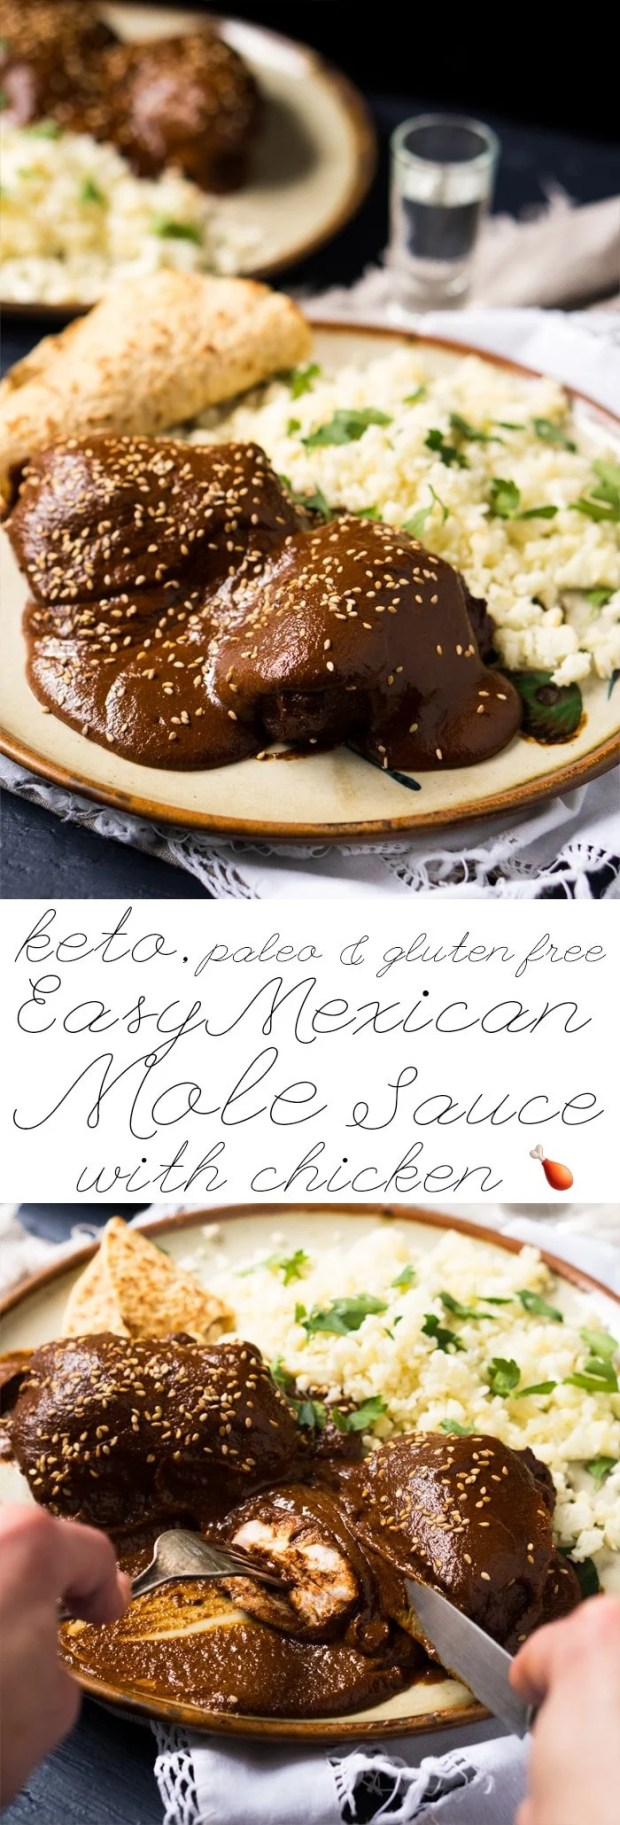 Gluten Free, Paleo & Keto Mexican Mole Sauce With Chicken 🍗 The easy version! #keto #ketomexican #ketodinner